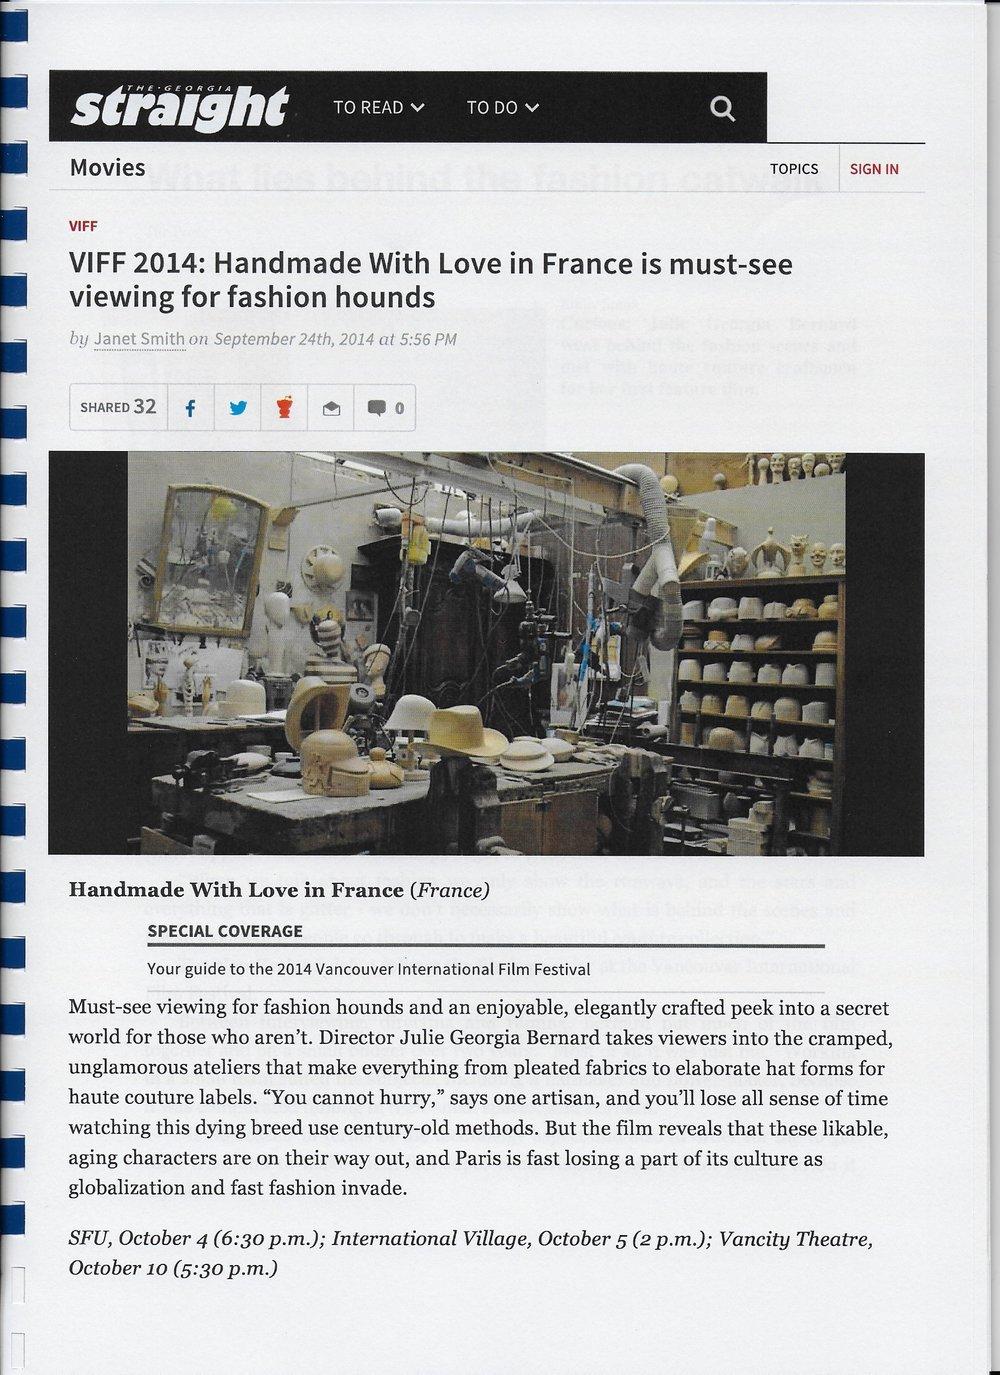 PRESS HAND MADE WITH LOVE 14.jpg